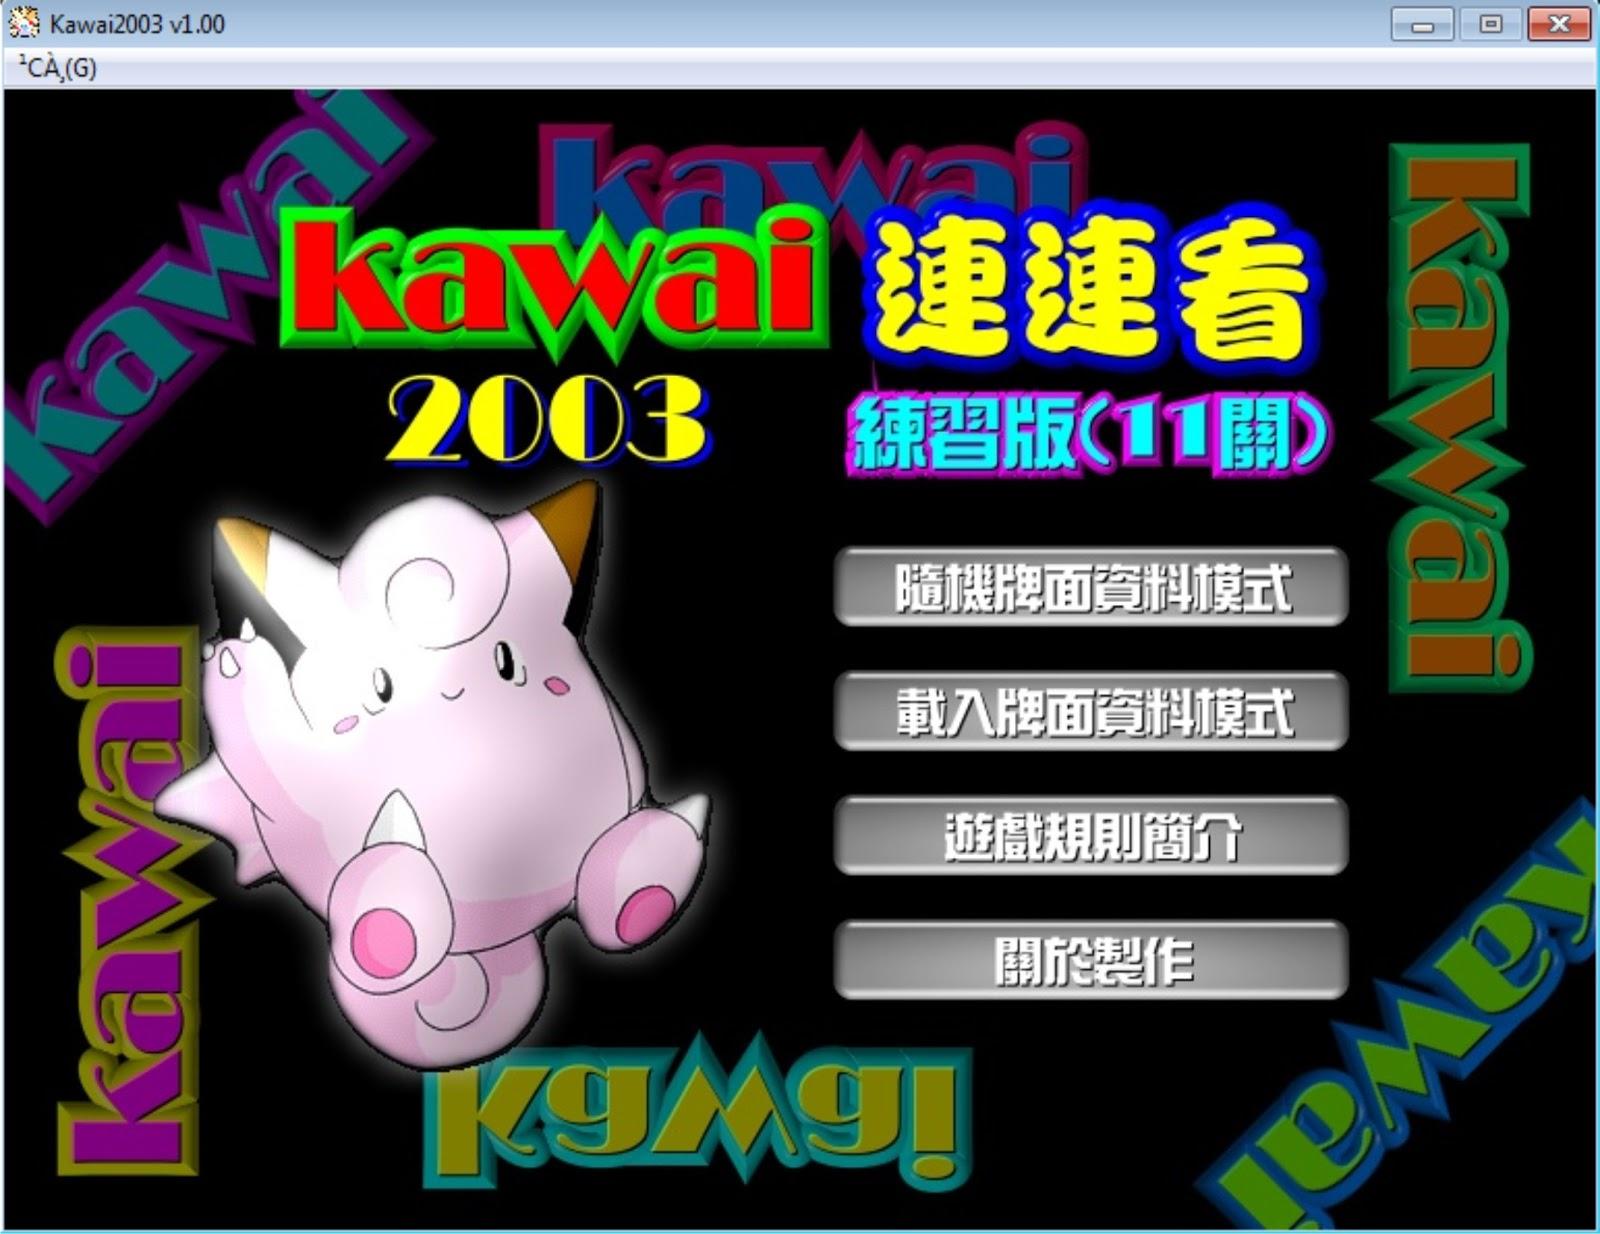 Game Kawai 2003